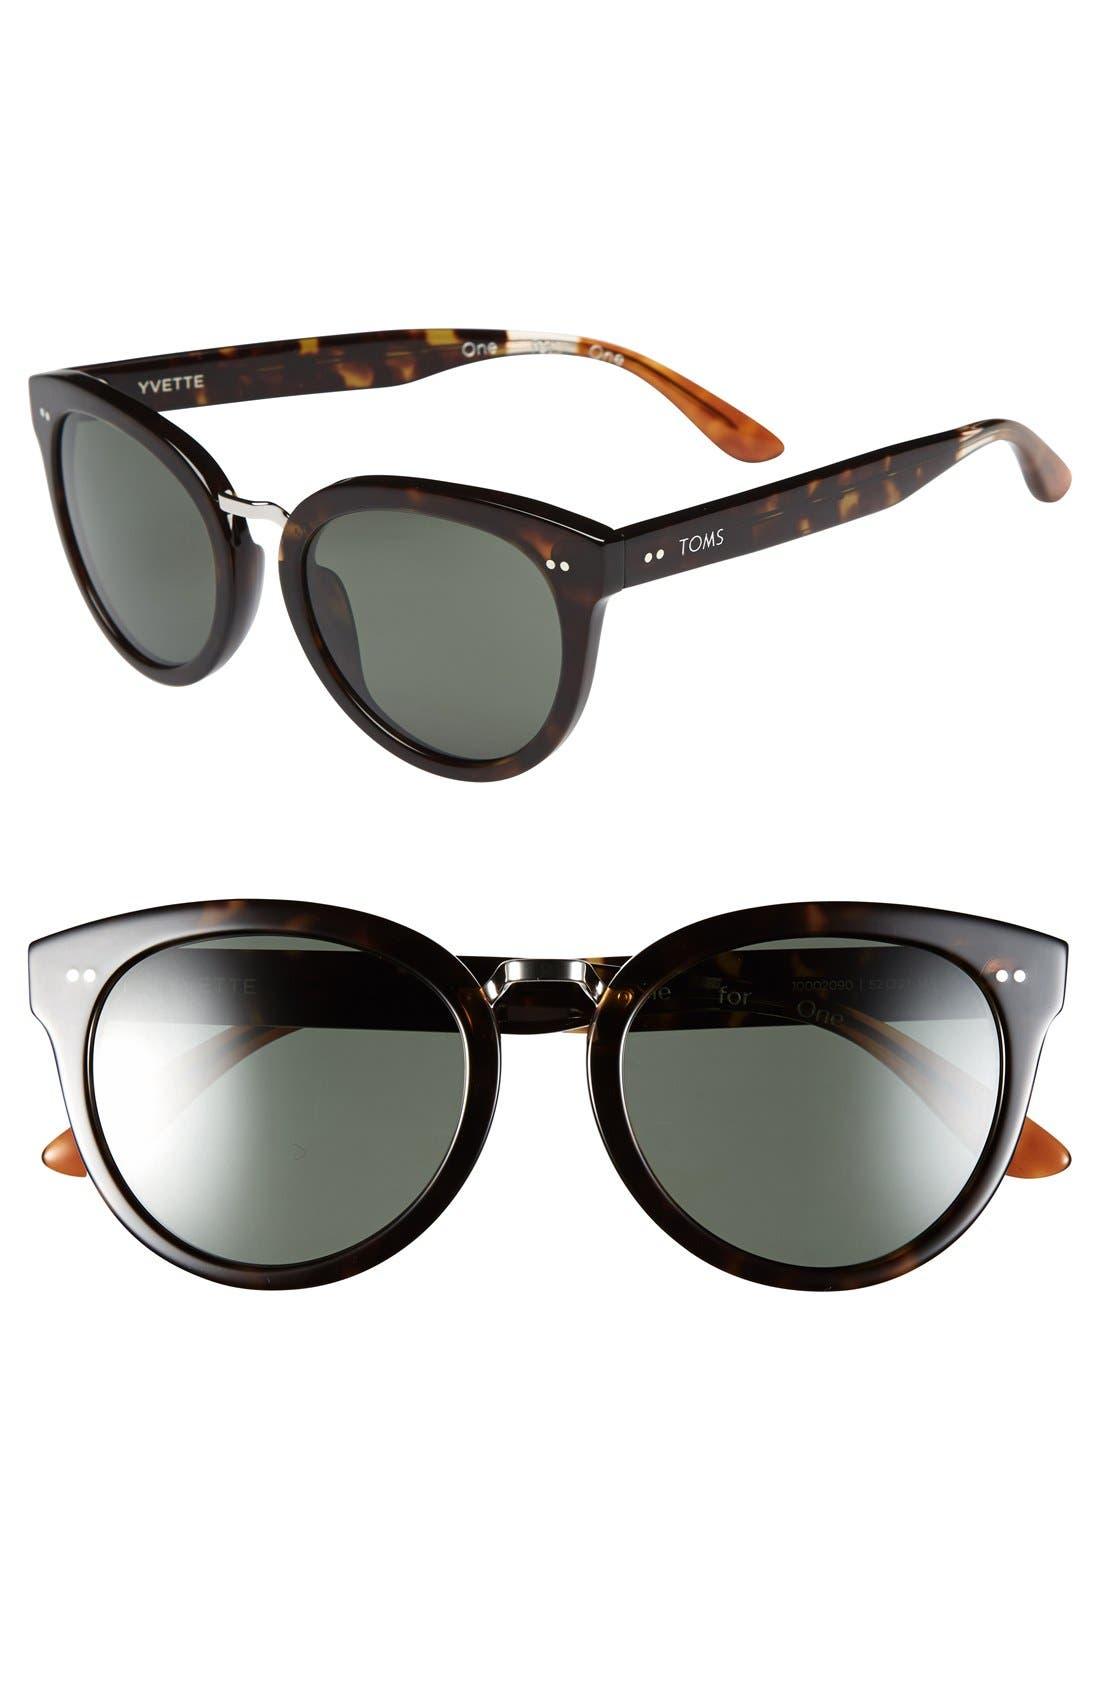 Main Image - TOMS 'Yvette' 52mm Polarized Sunglasses